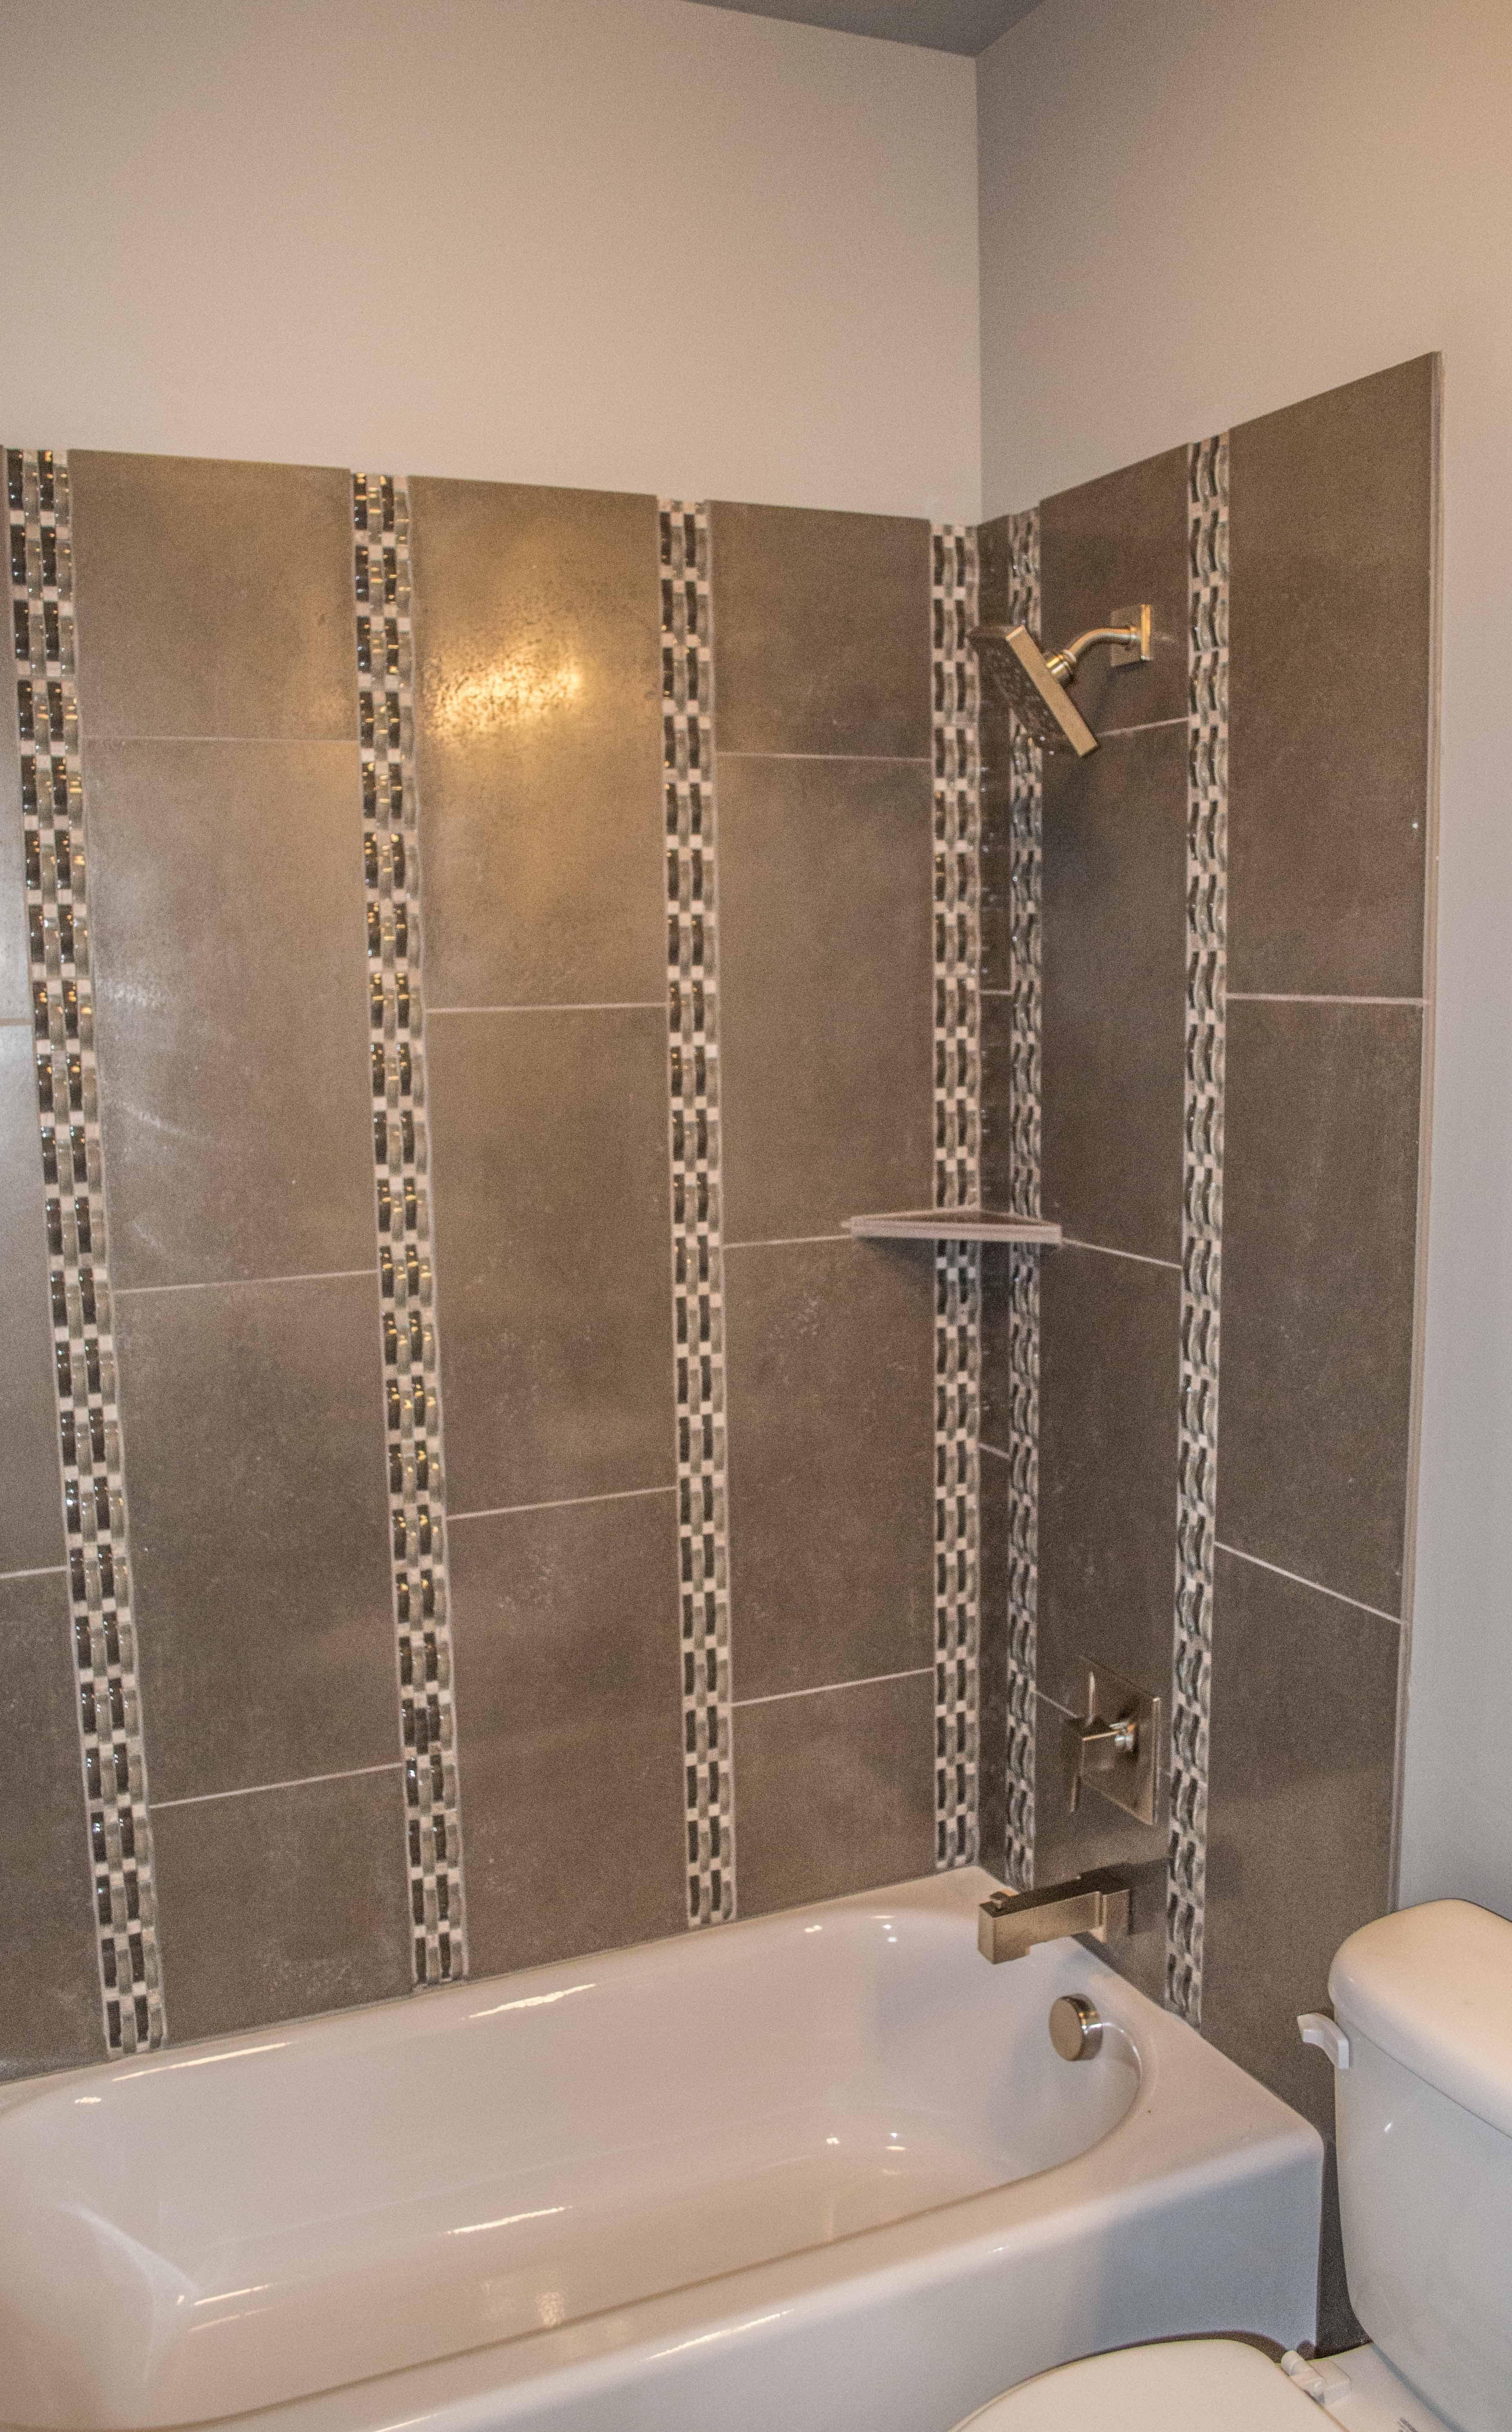 extraordinary bathroom design tile showers ideas | Tile designs make the ordinary bathroom look extraordinary ...